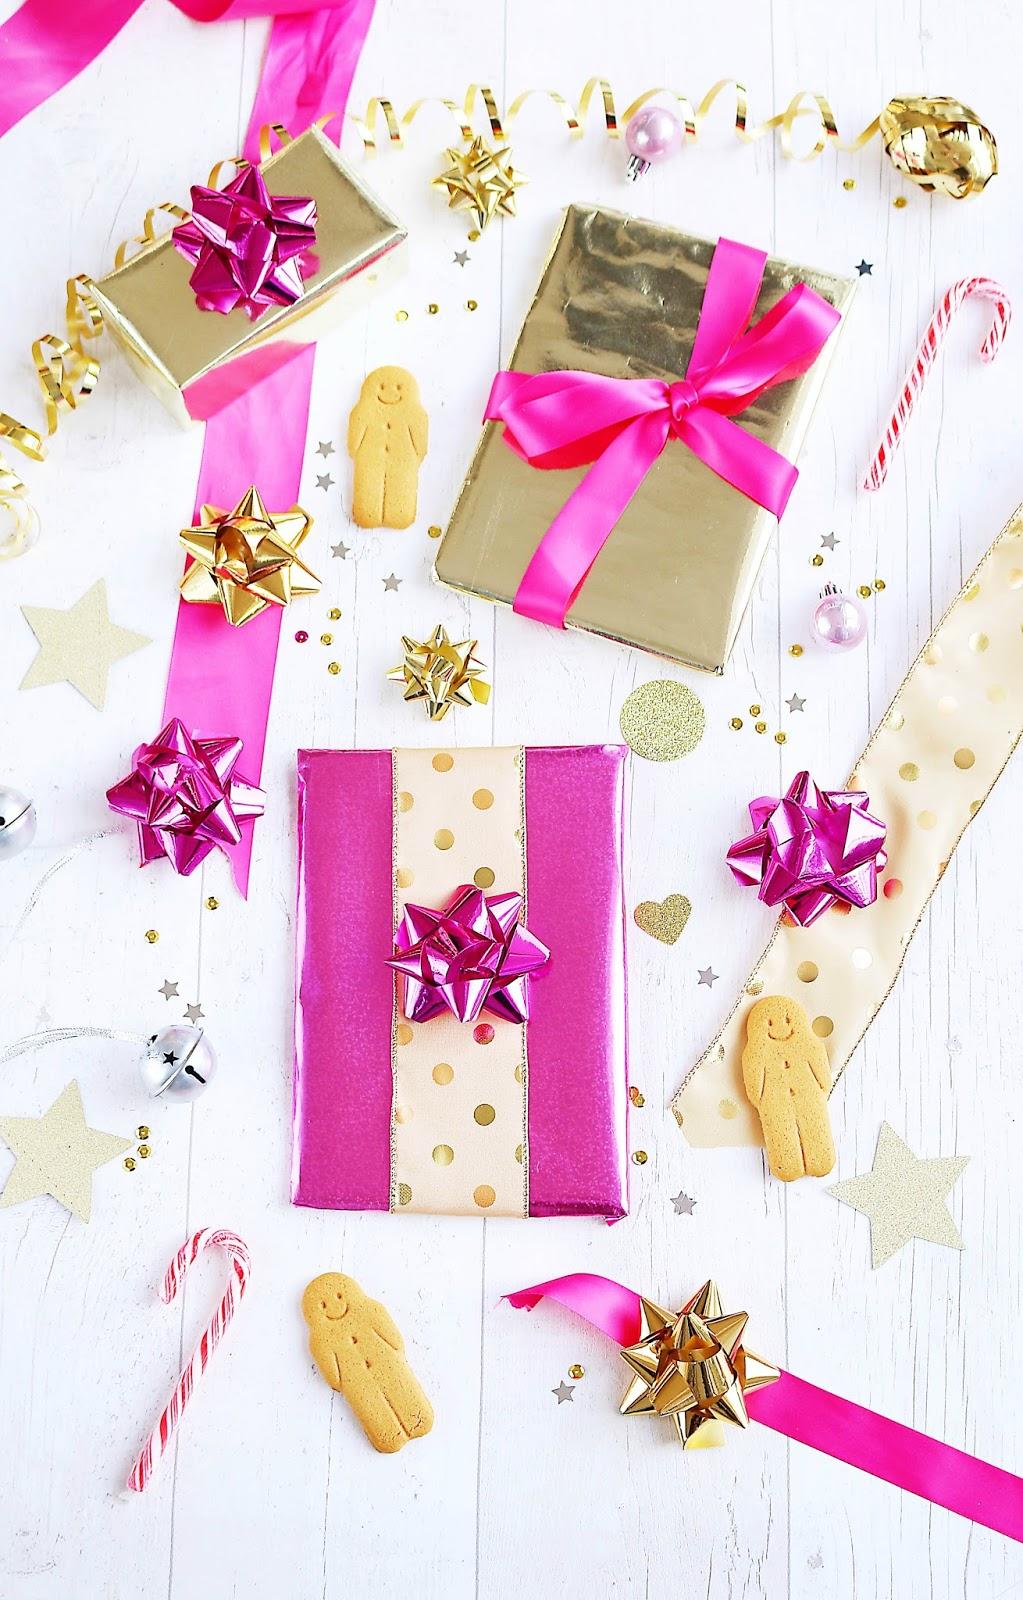 Christmas, Blogmas, Presents, Lifestyle, Wrapping Ideas, Pinterest, Saving Money,  Pinterest wrapping ideas, Pinterest gift wrapping, Pinterest Present wrapping, present wrapping ideas on a budget